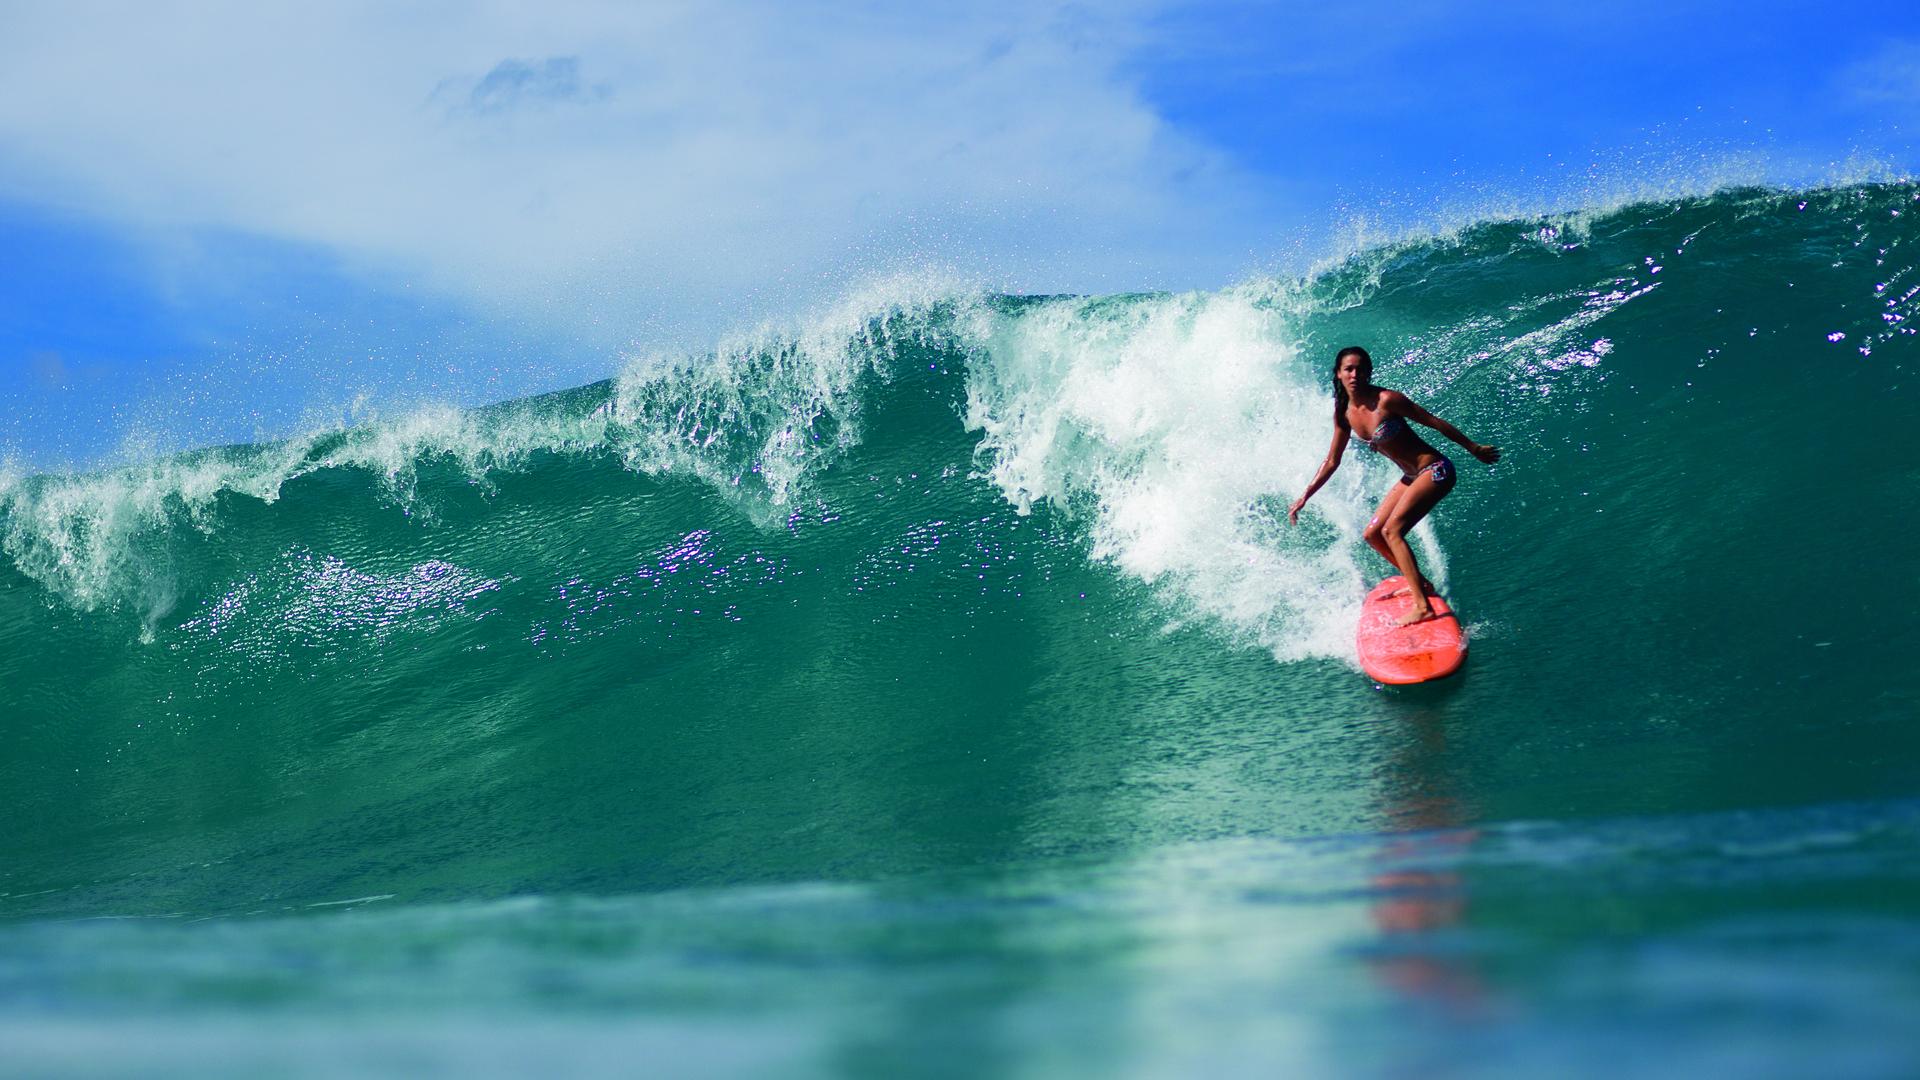 surfer wallpaper 1920x1080